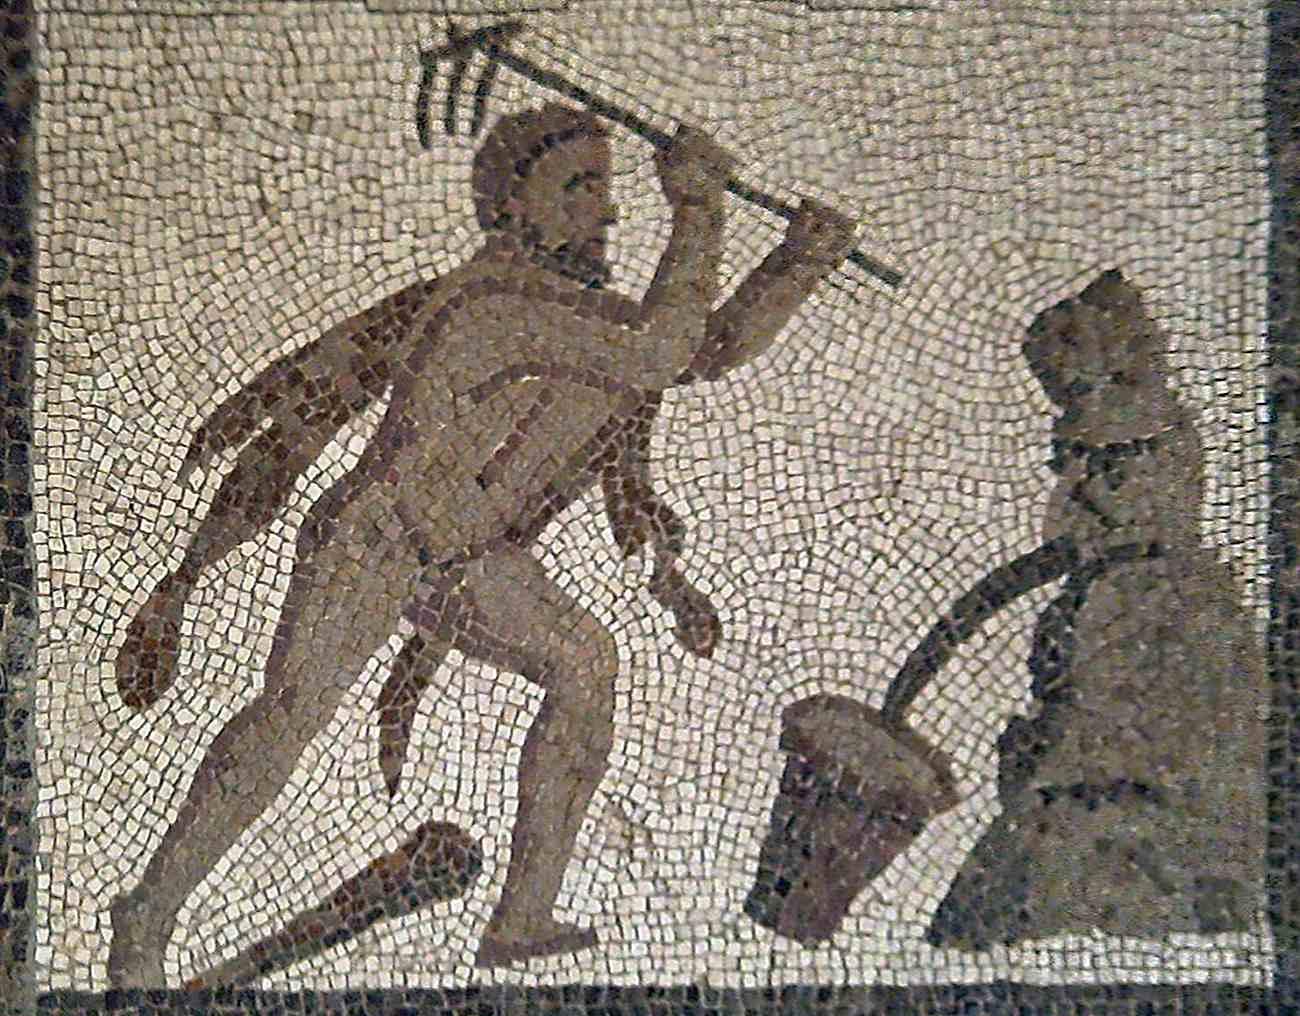 Hercules cleans the Augean stables (Llíria mosaic)